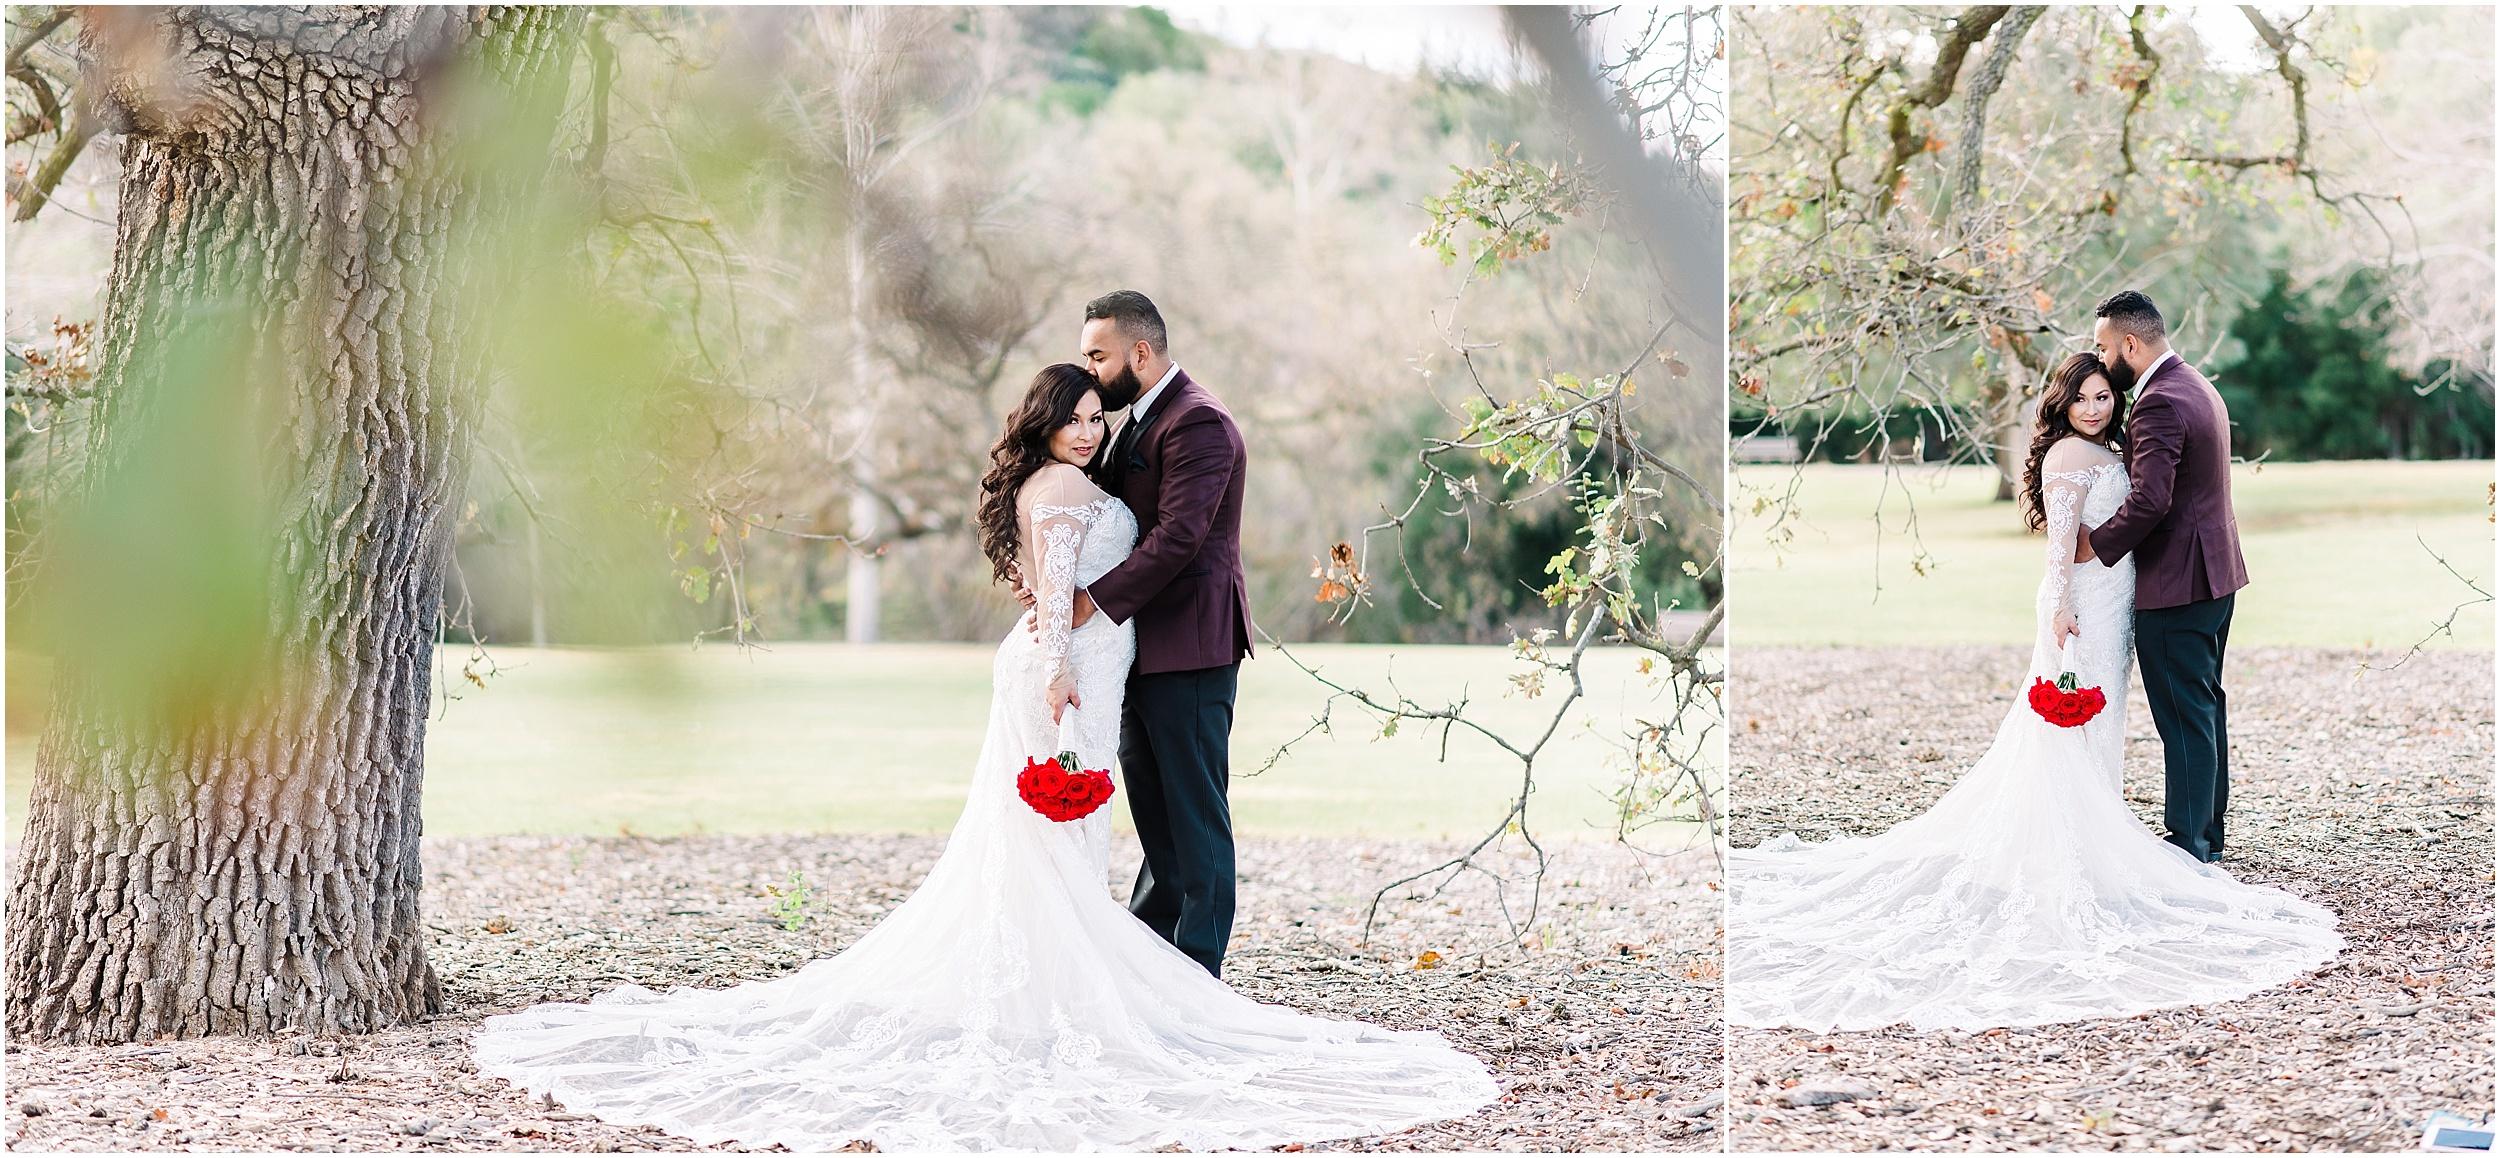 Ventura-California-and-Tallahassee-Florida-Wedding-Photographer-Crystal-and-Daniel-Wedding-at-Westlake-California_0048.jpg